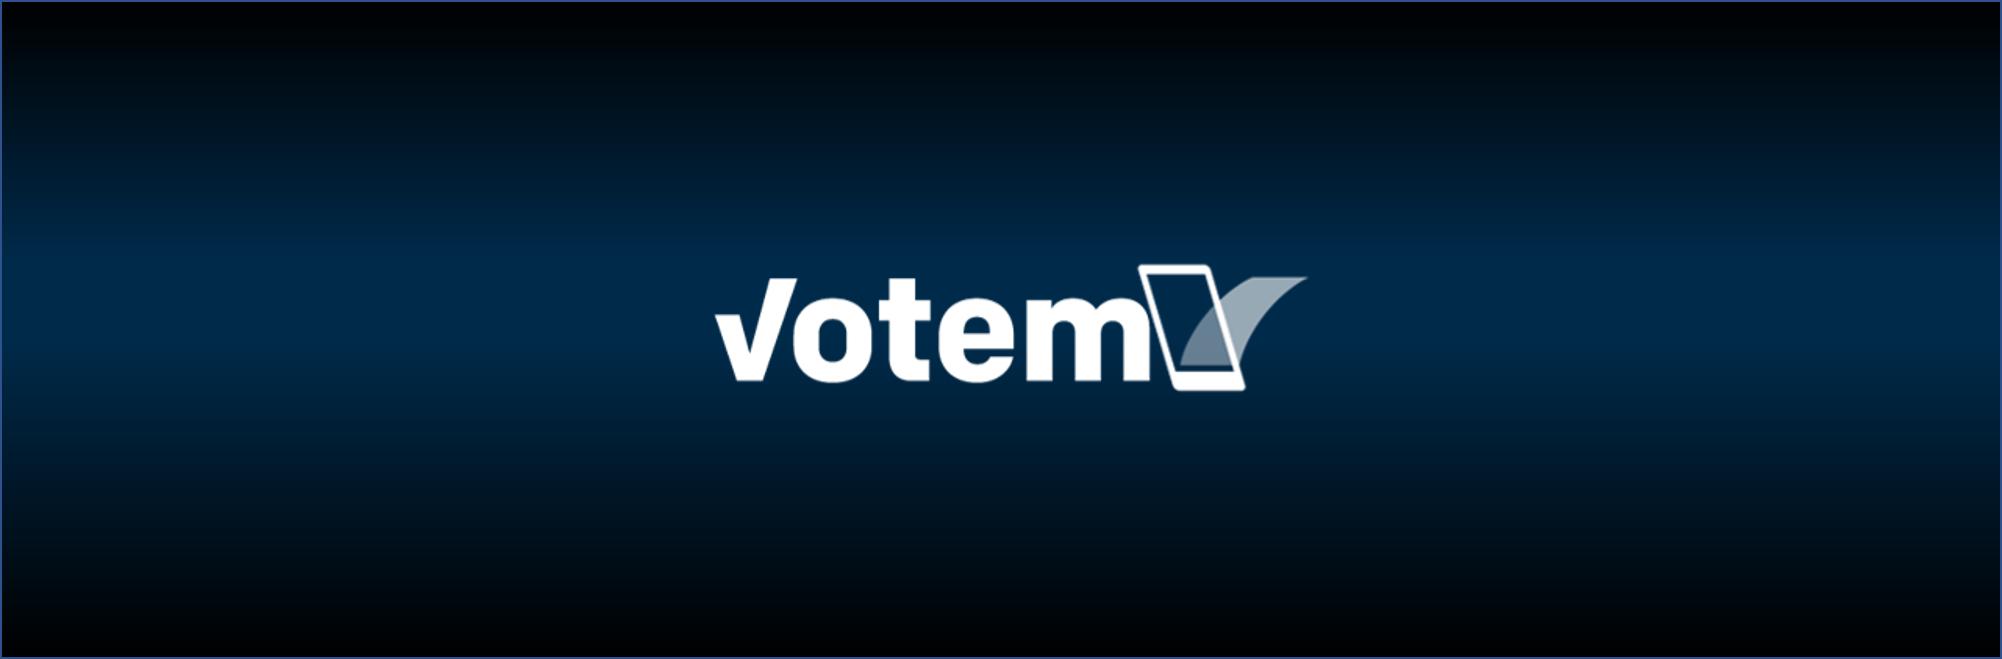 votem banner